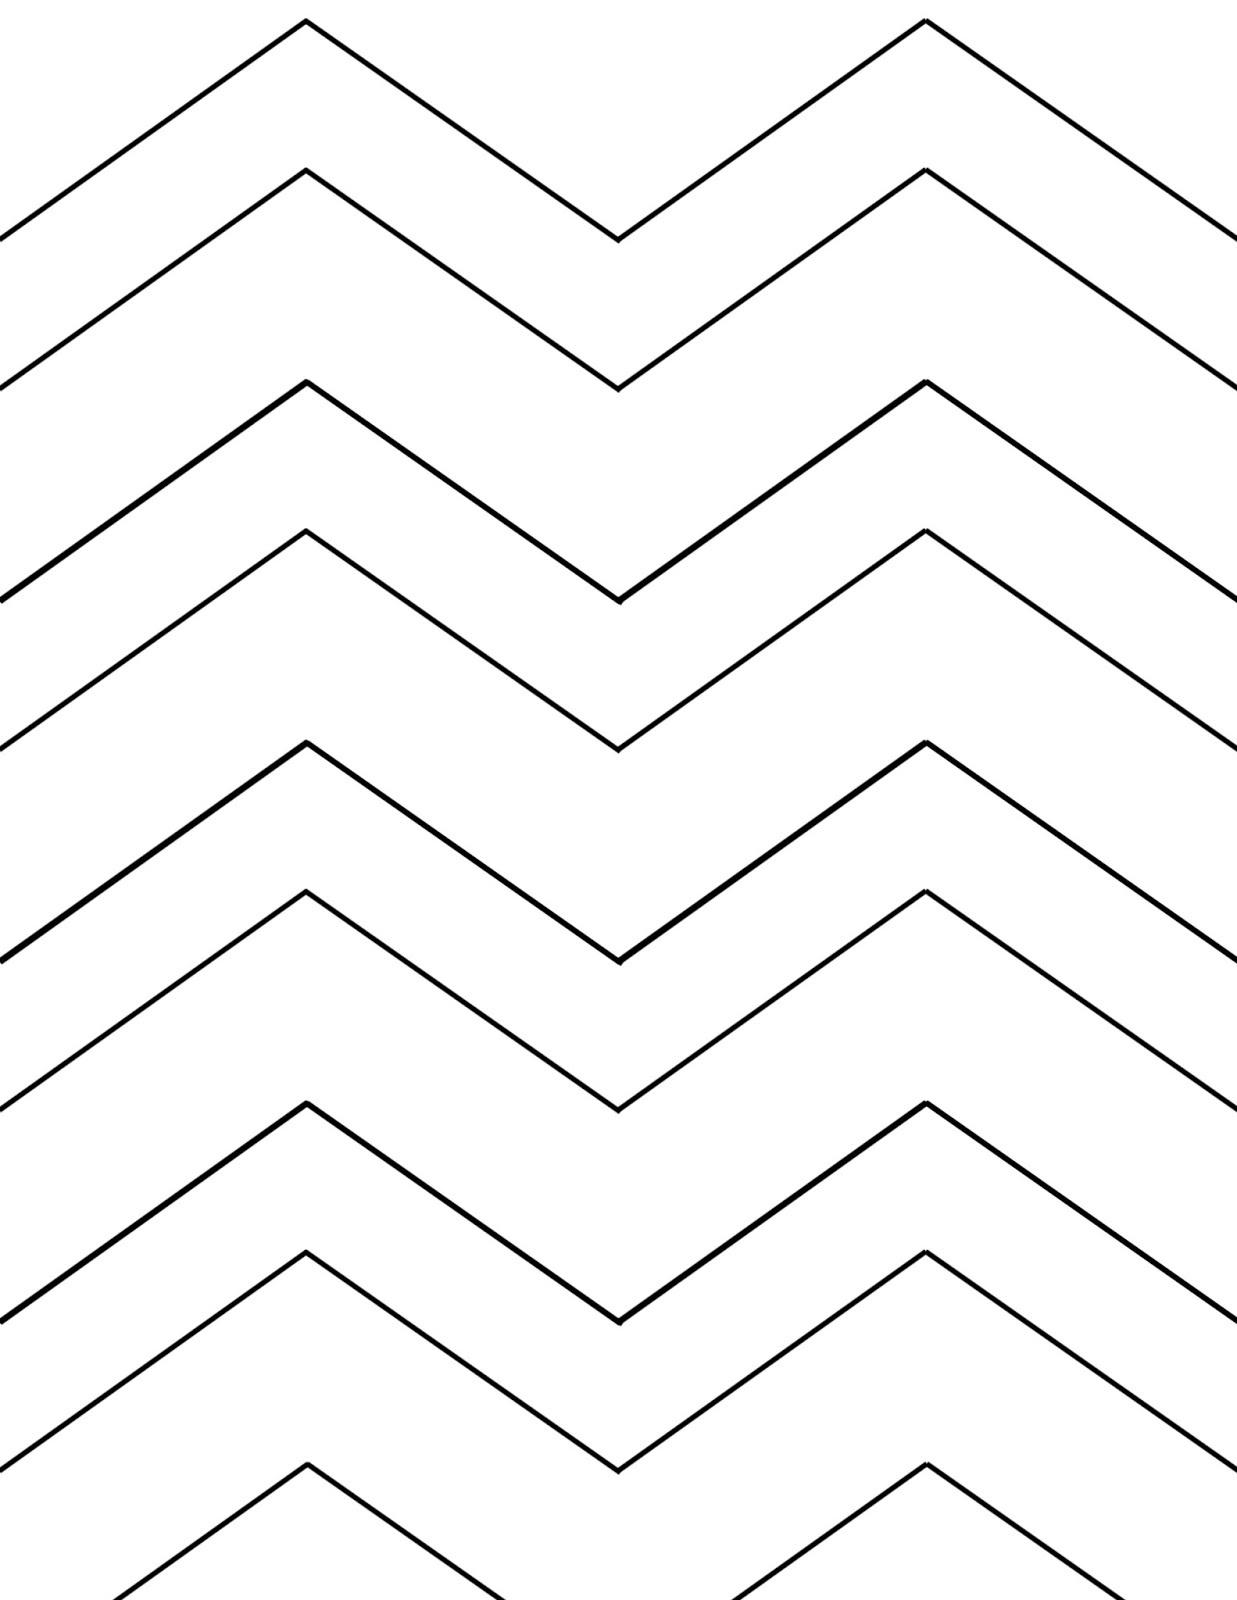 Index Of /cdn/8/1991/264 - Chevron Pattern Printable Free